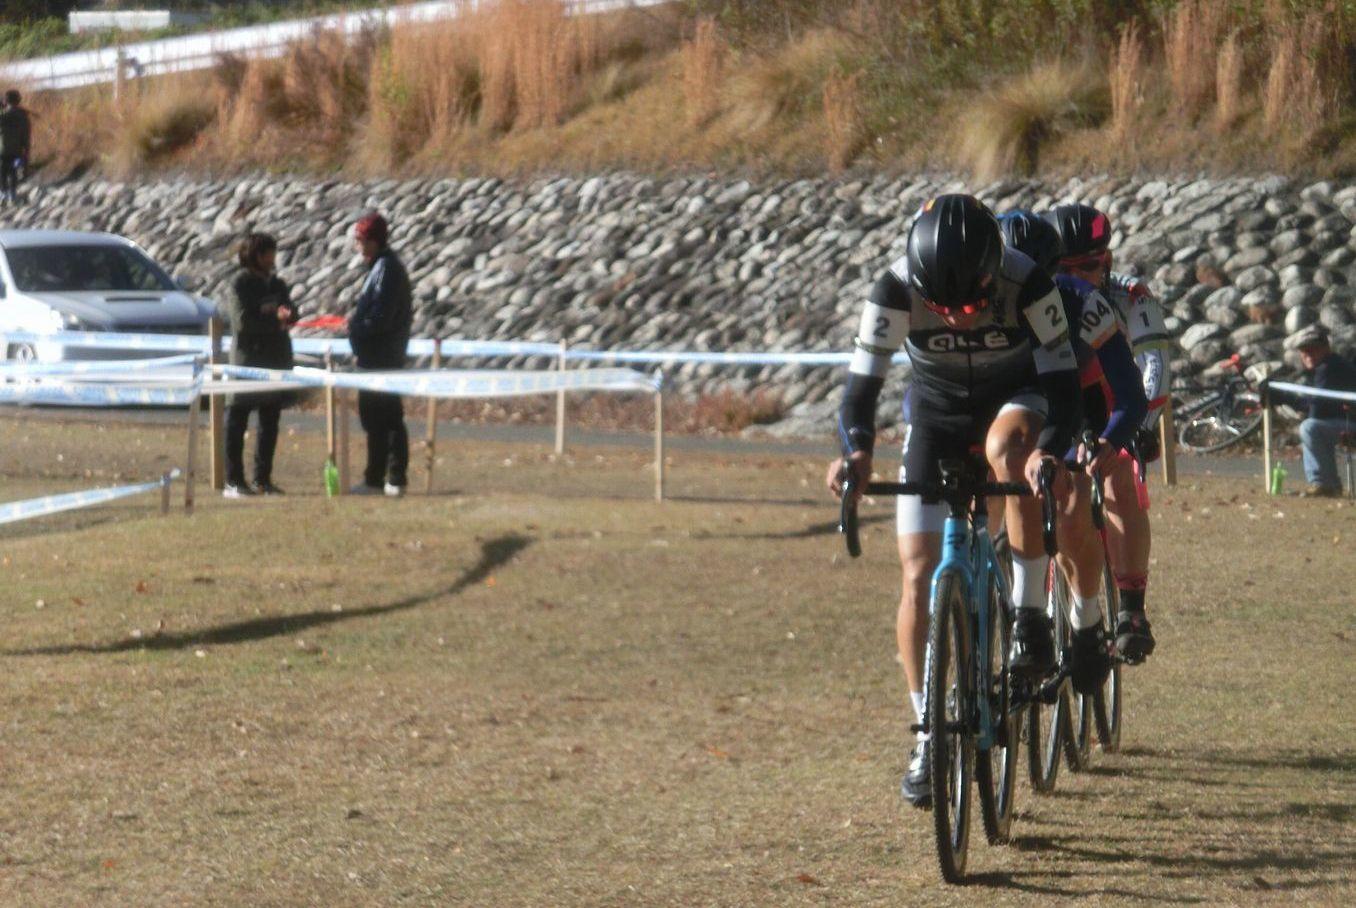 https://www.cyclocross.jp/news/19377ab1fdc92827009596729c49c6037ad0acdd.JPG